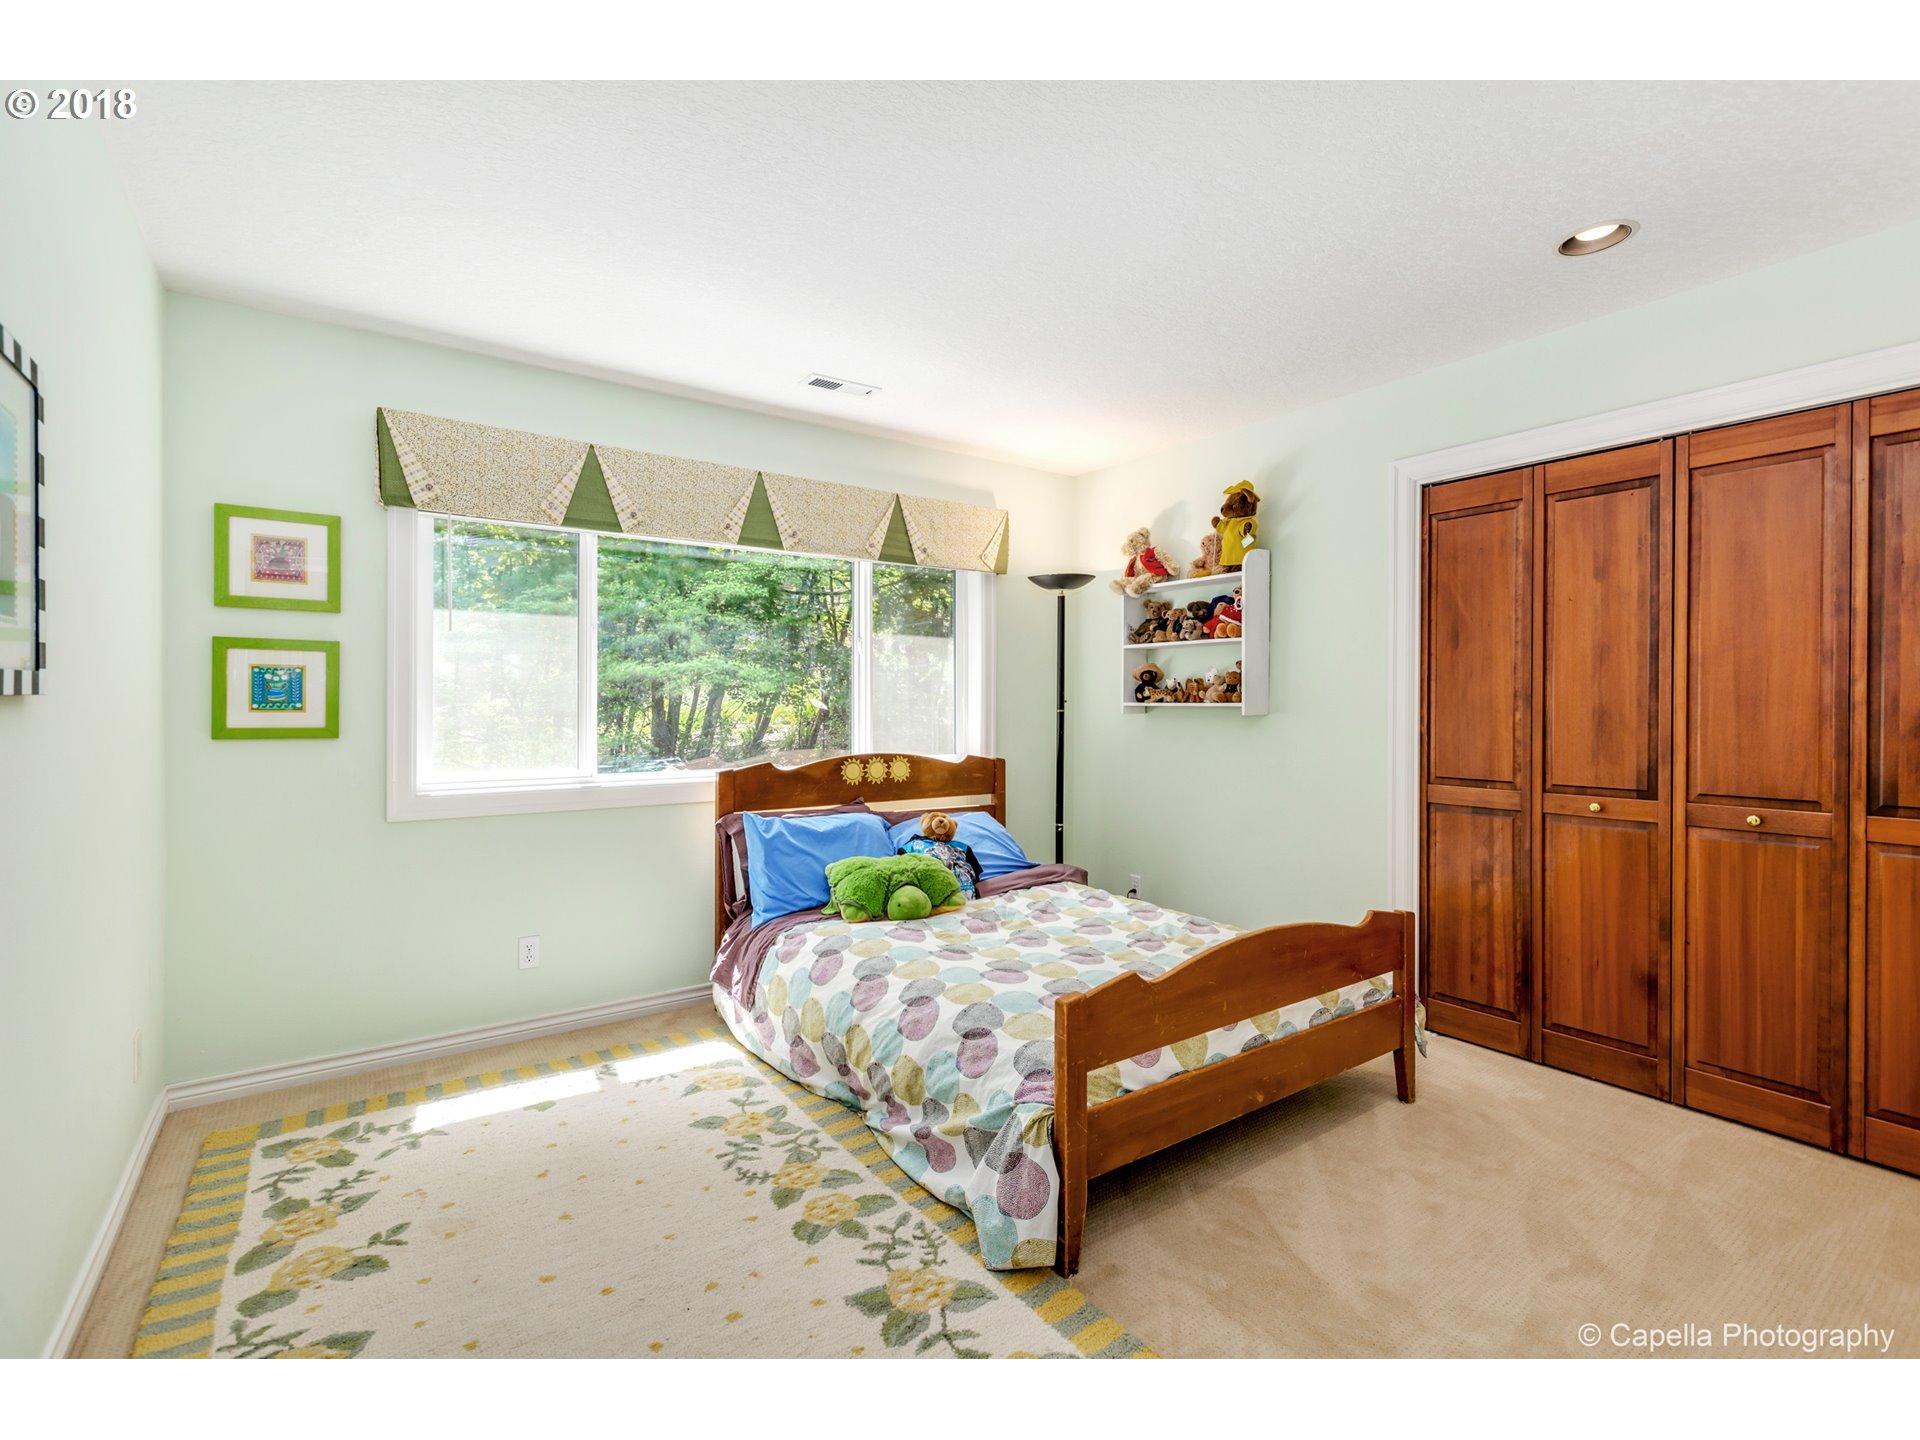 1180 CHERRY LN Lake Oswego, OR 97034 - MLS #: 18064992